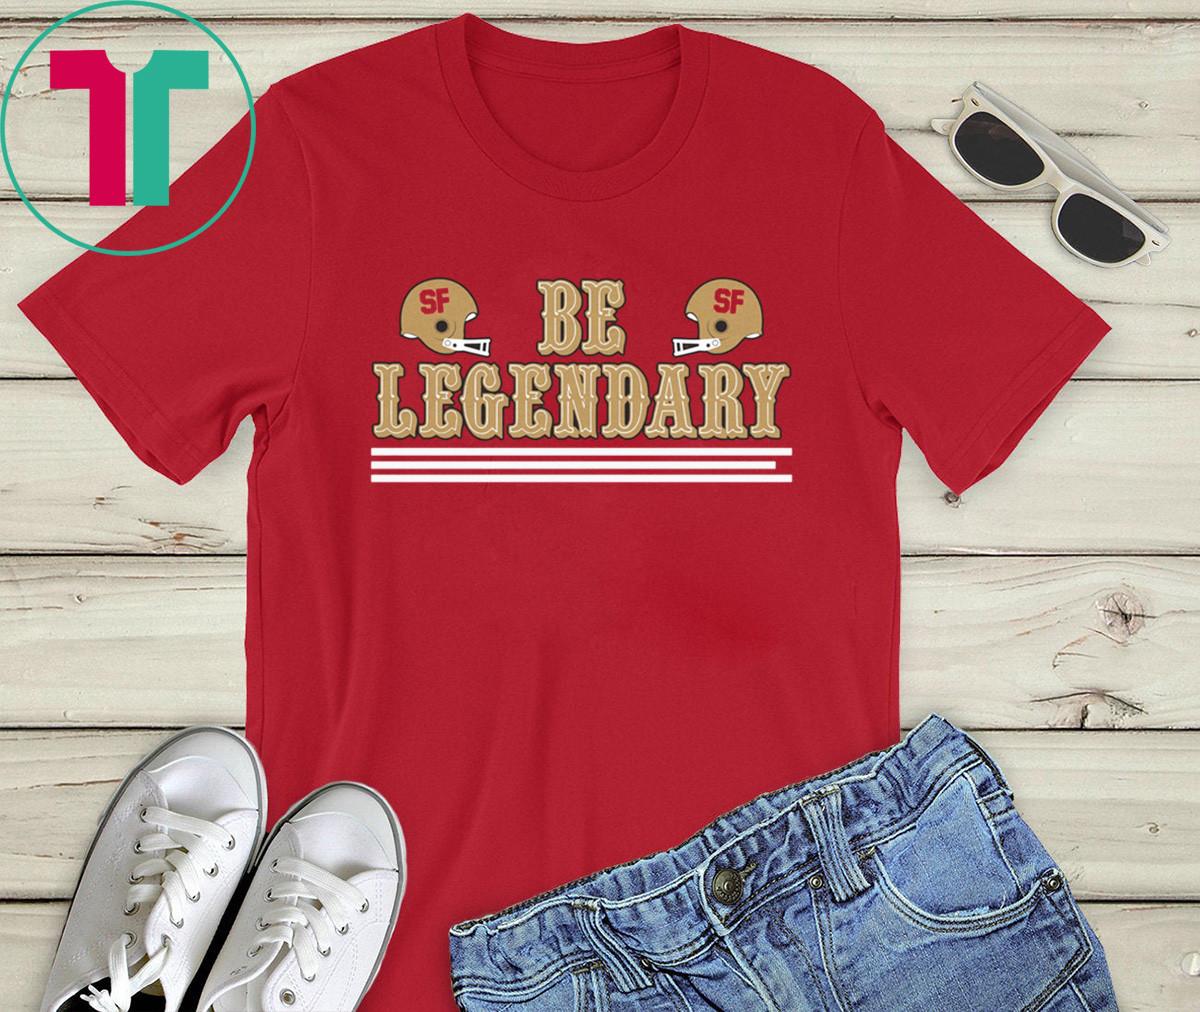 San Francisco Be Legendary Shirt